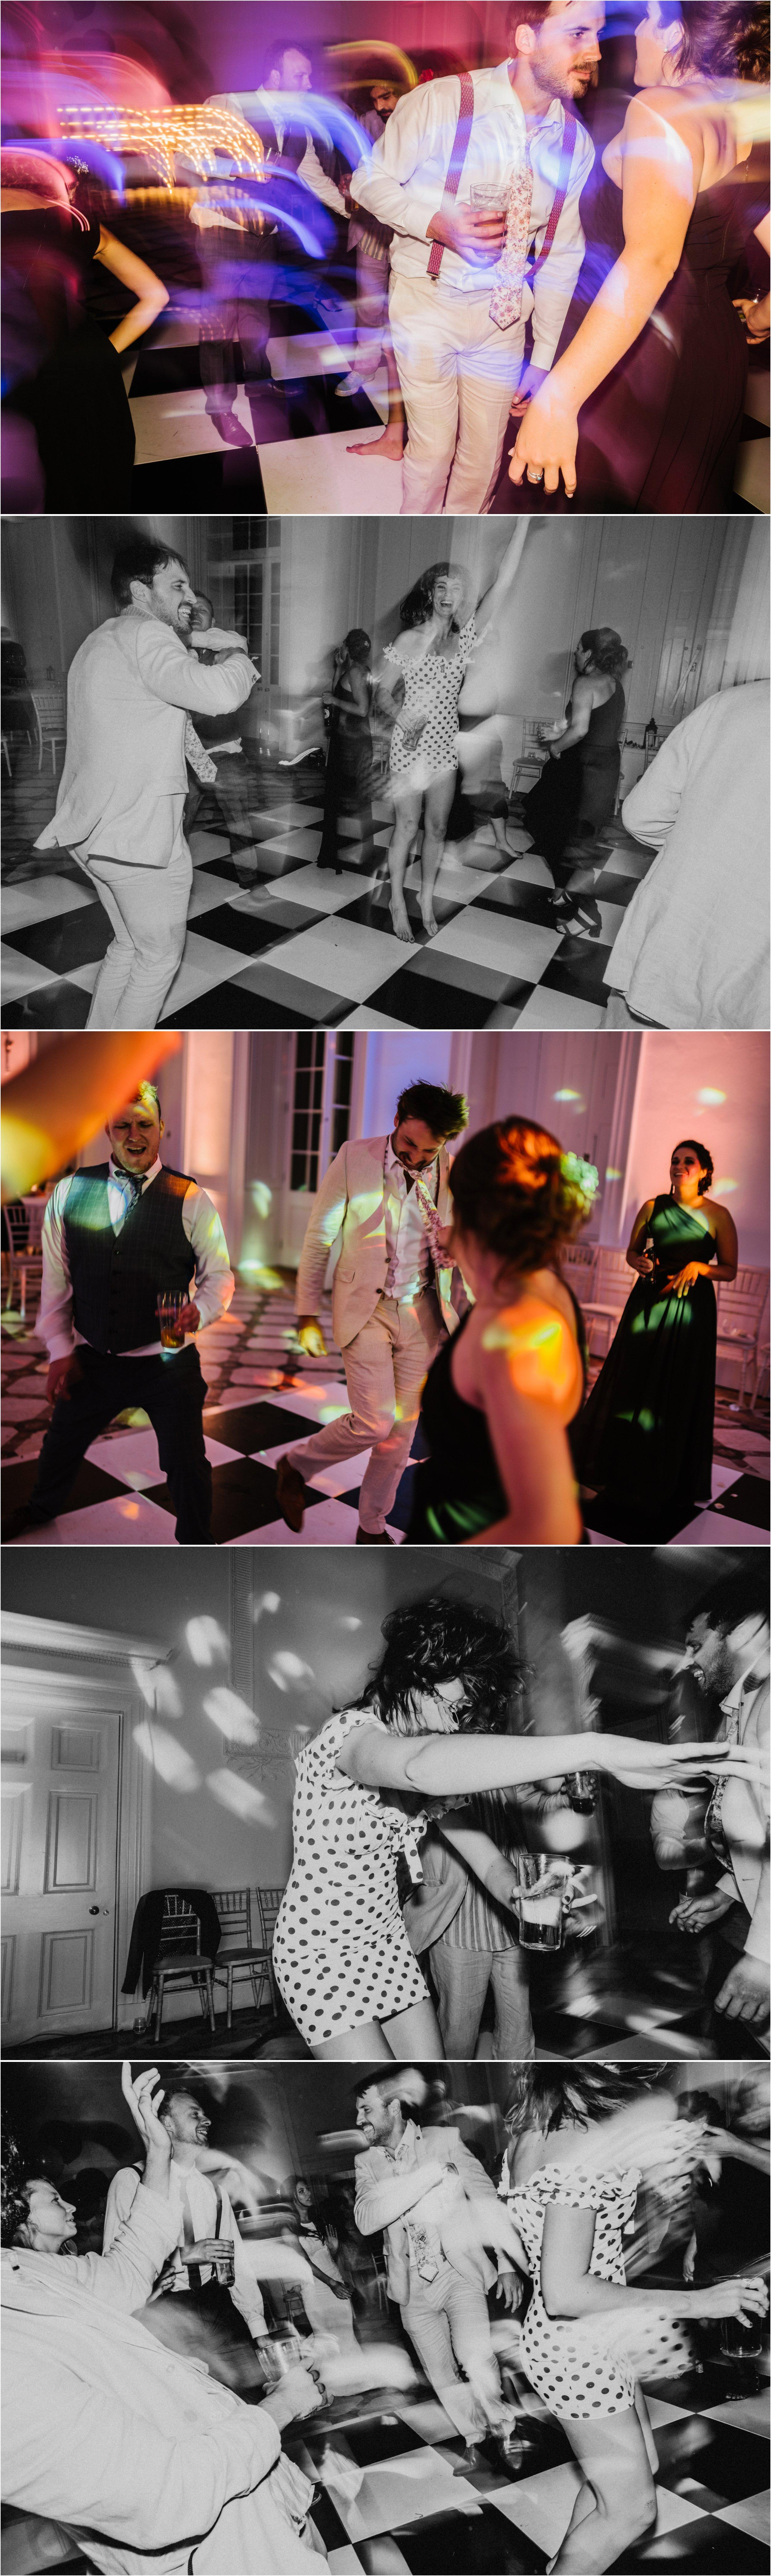 Compton Verney wedding photography_0216.jpg